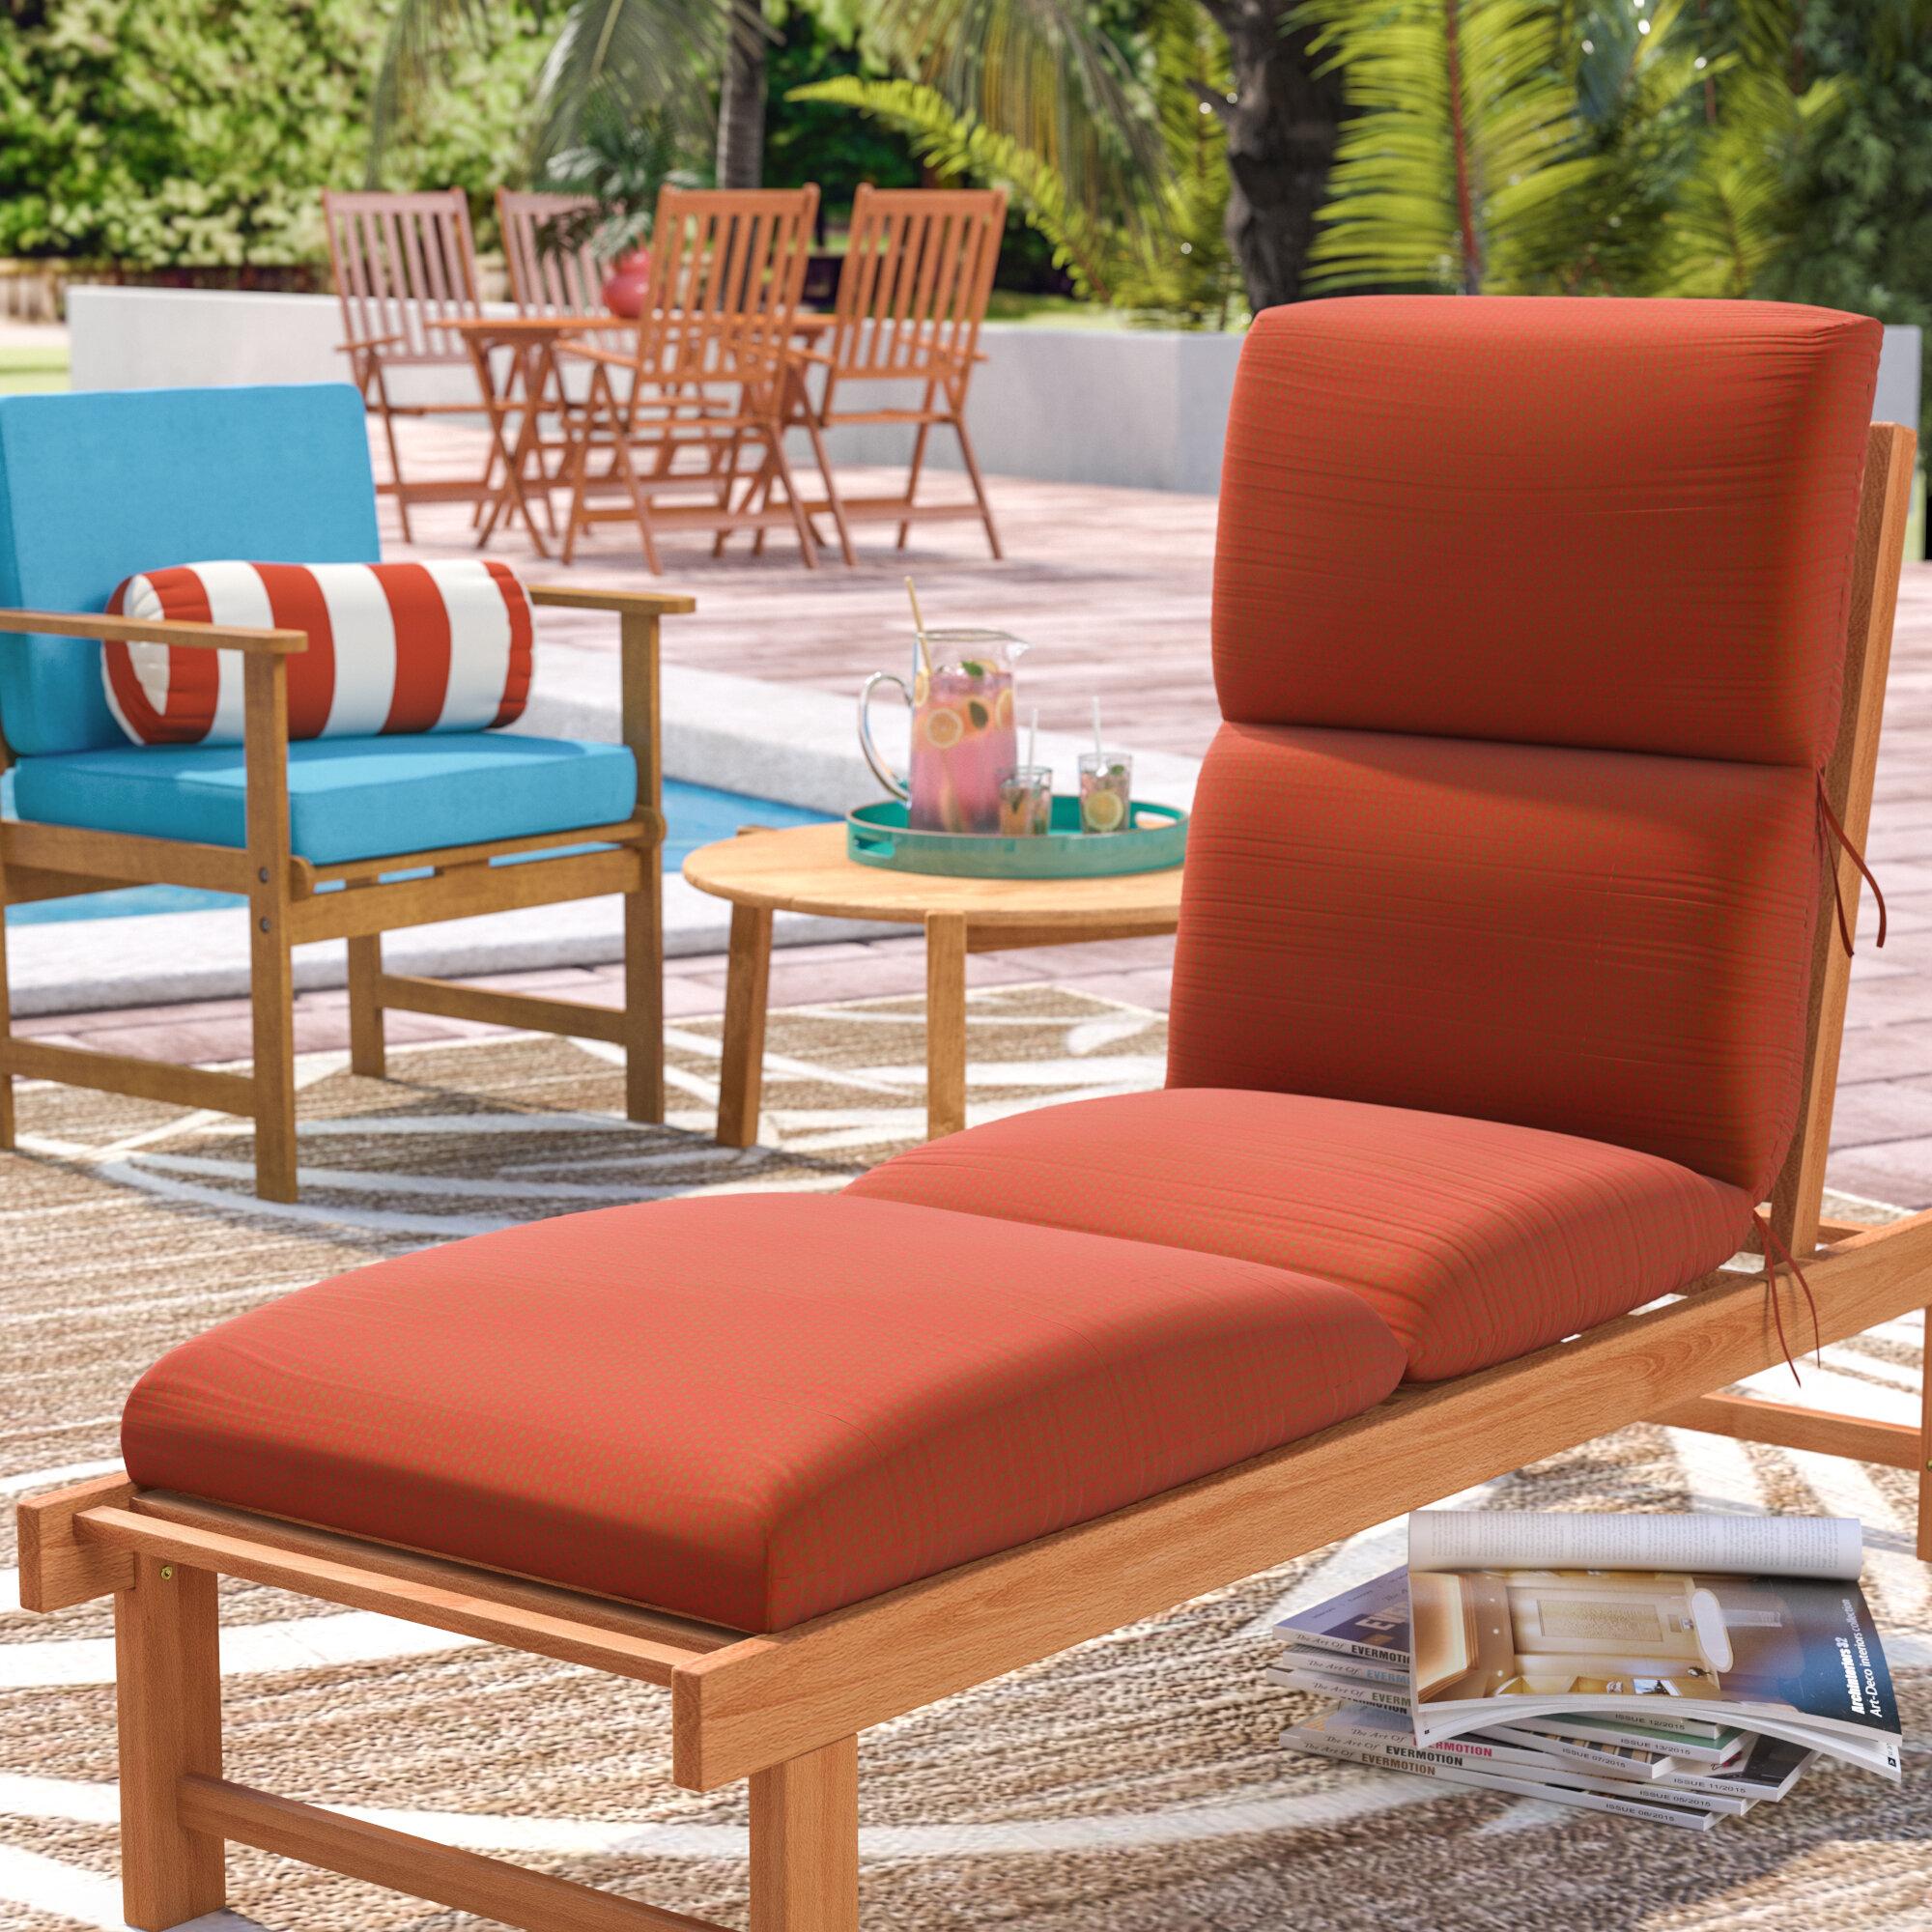 - Beachcrest Home Kellner Indoor/Outdoor Sunbrella Chaise Lounge